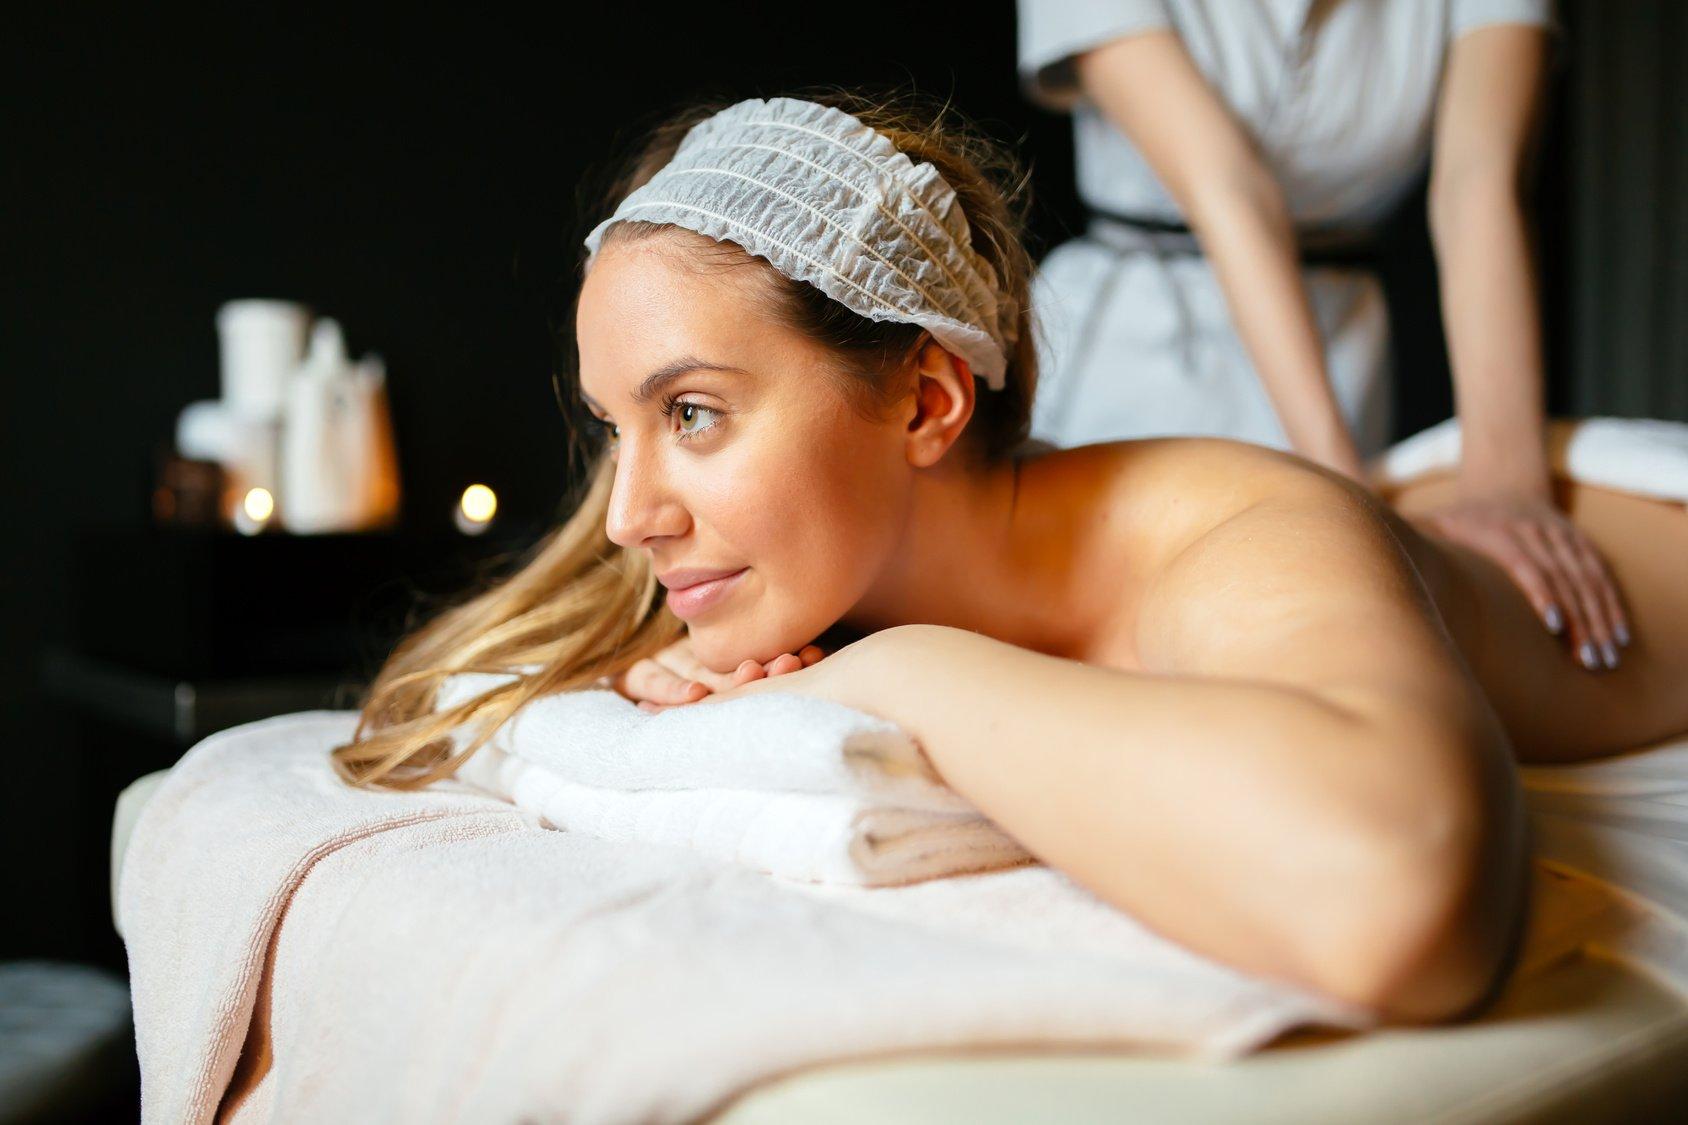 Lovely brunette enjoying massage treatment by therapist